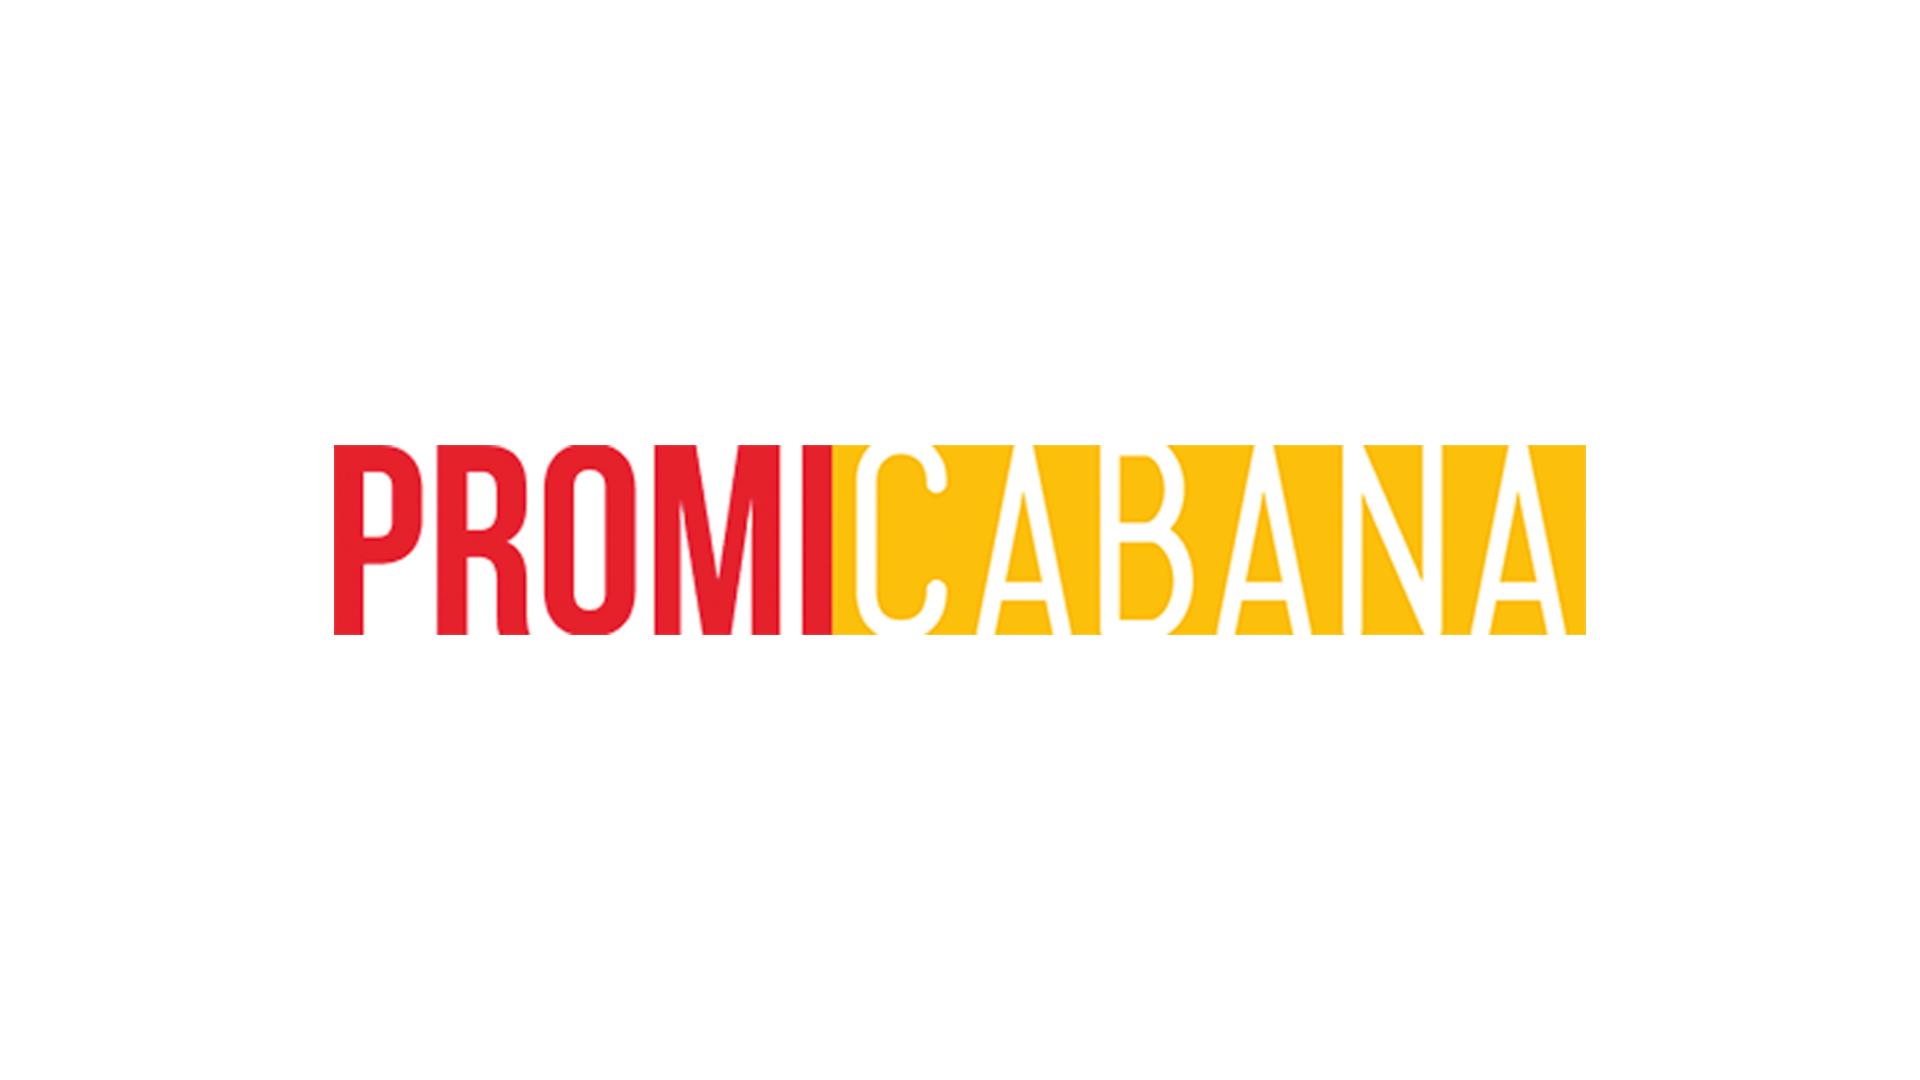 Matthew-McConaughey-Interstellar